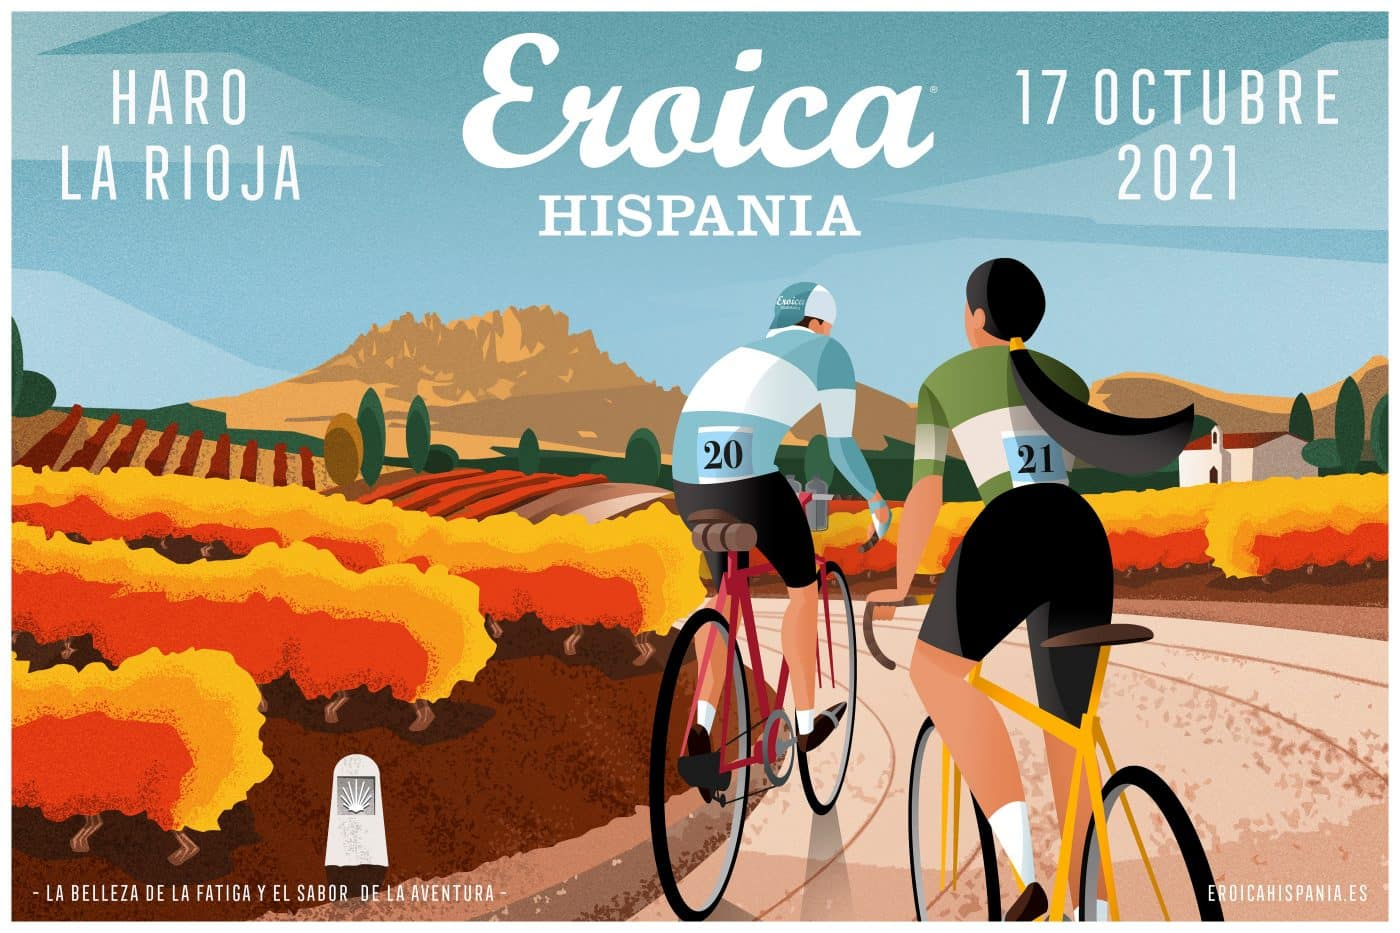 Eroica Hispania 2021